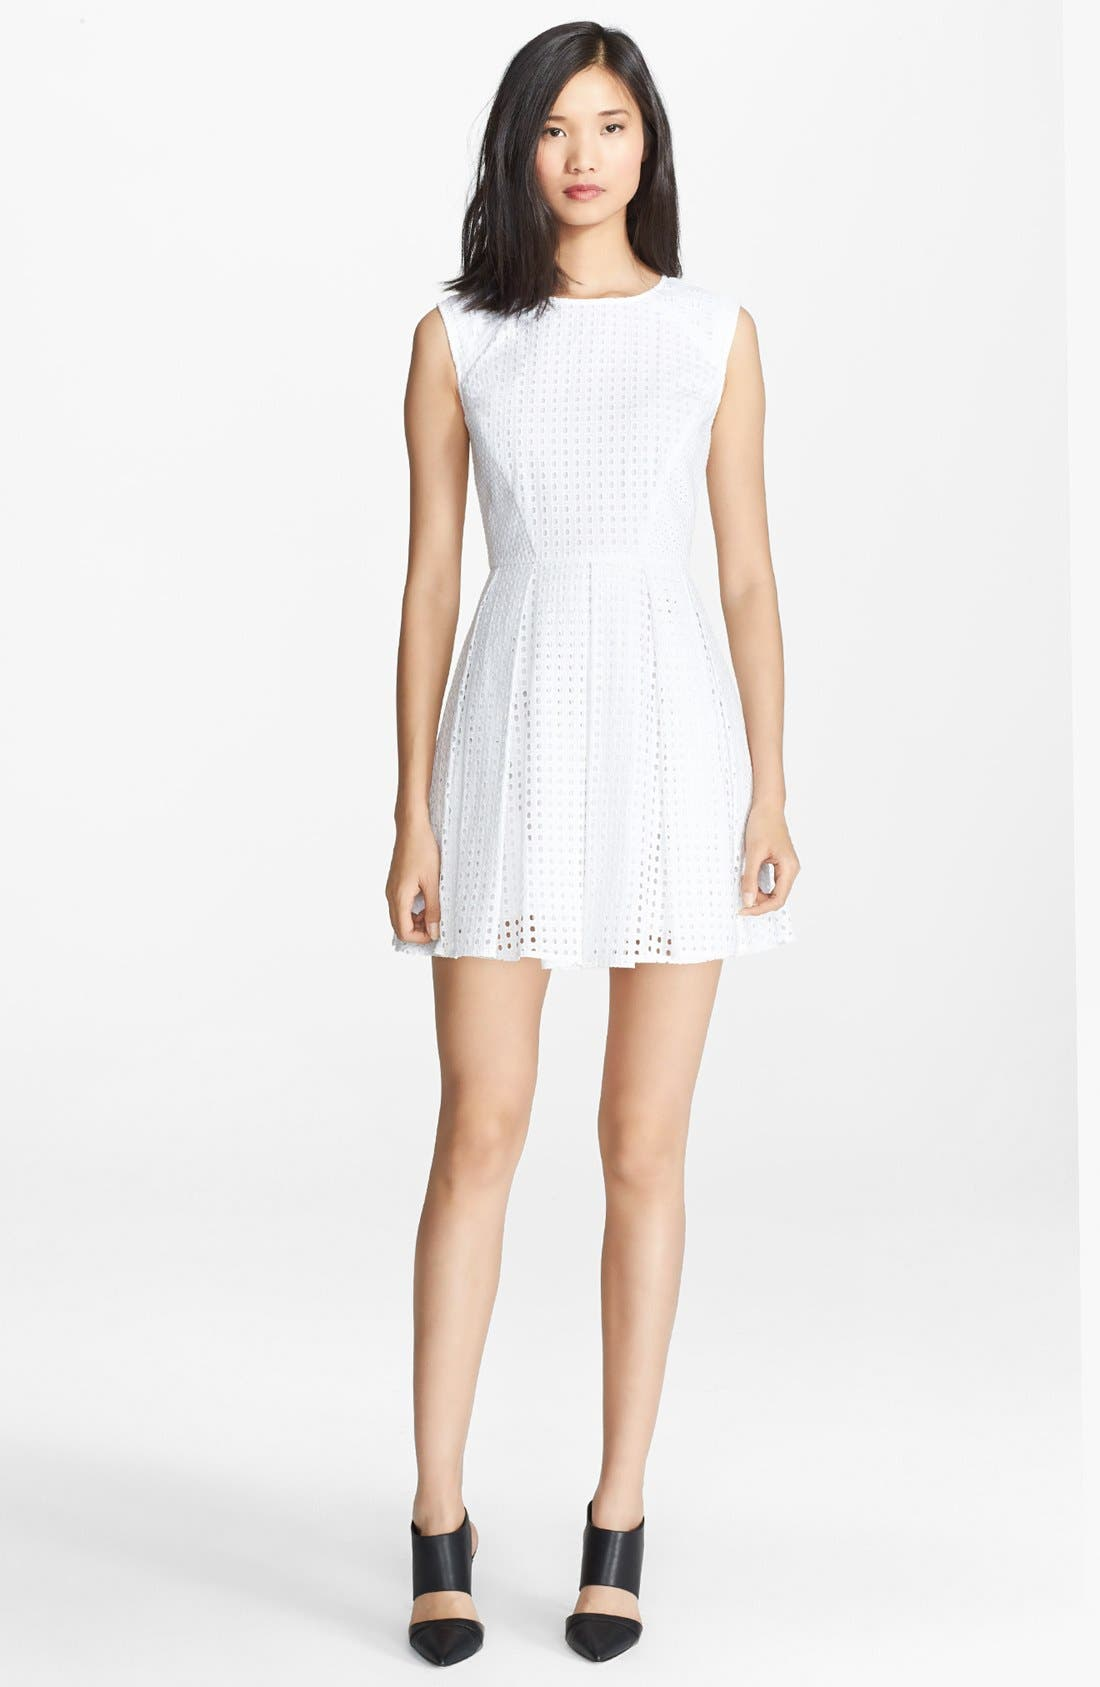 Alternate Image 1 Selected - Rachel Zoe 'Marcel' Cotton Eyelet Fit & Flare Dress